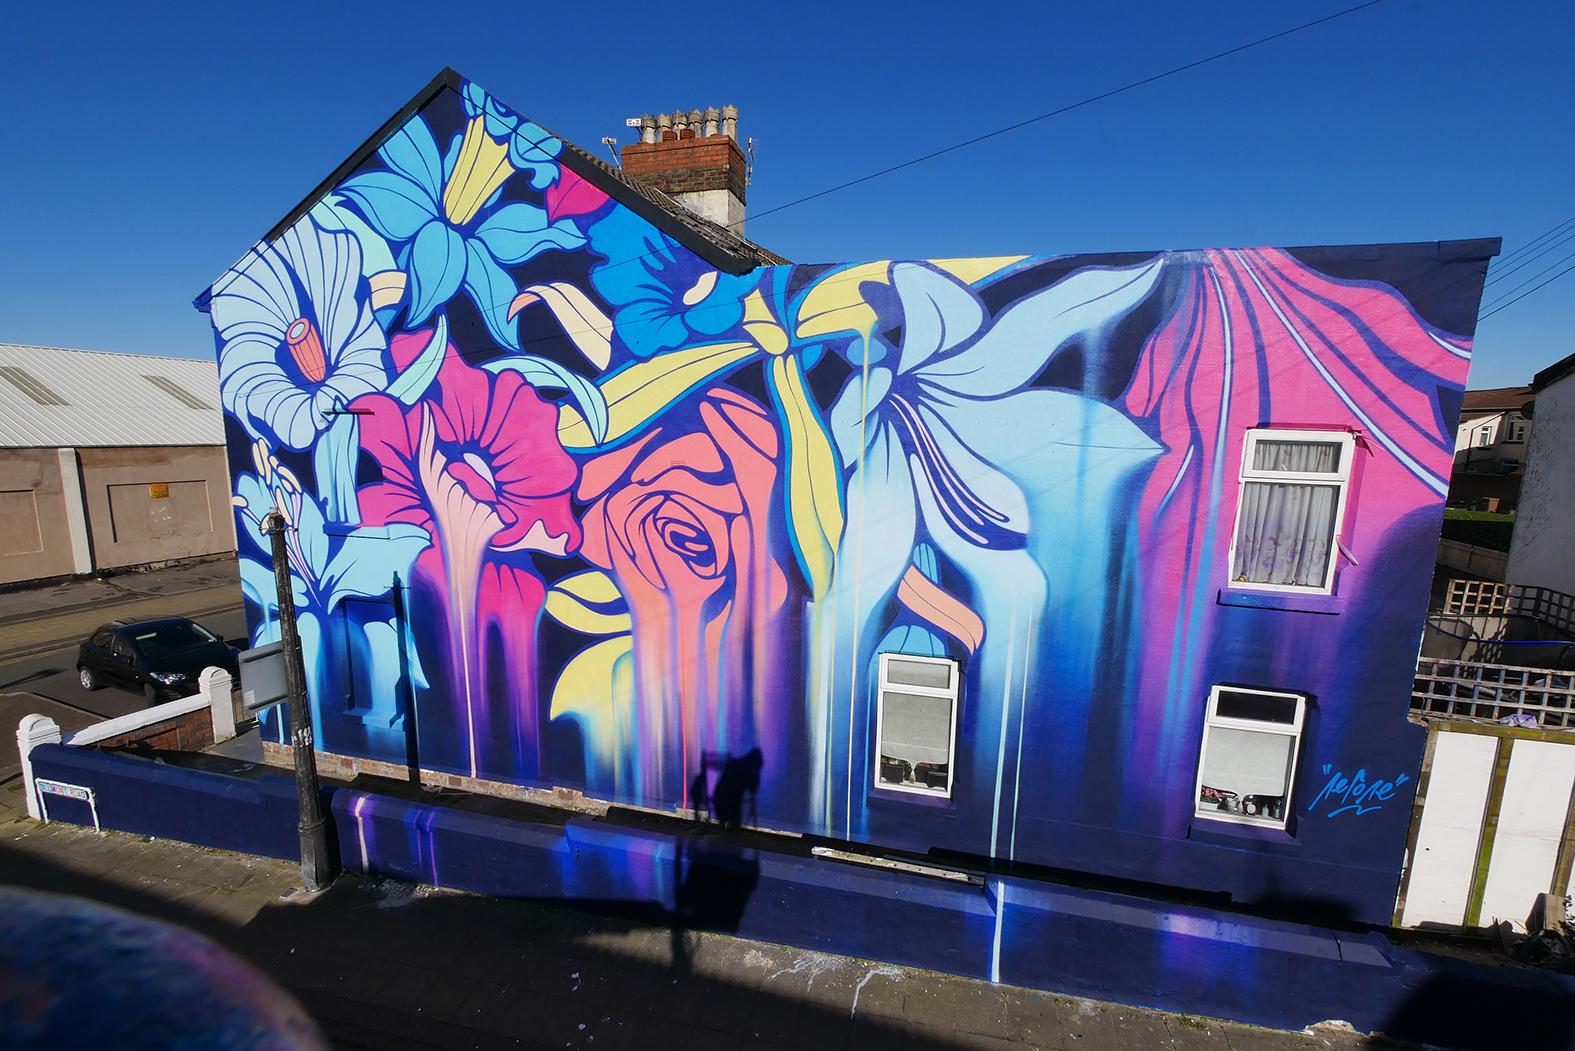 Nerone-New-brighton-street-art-2